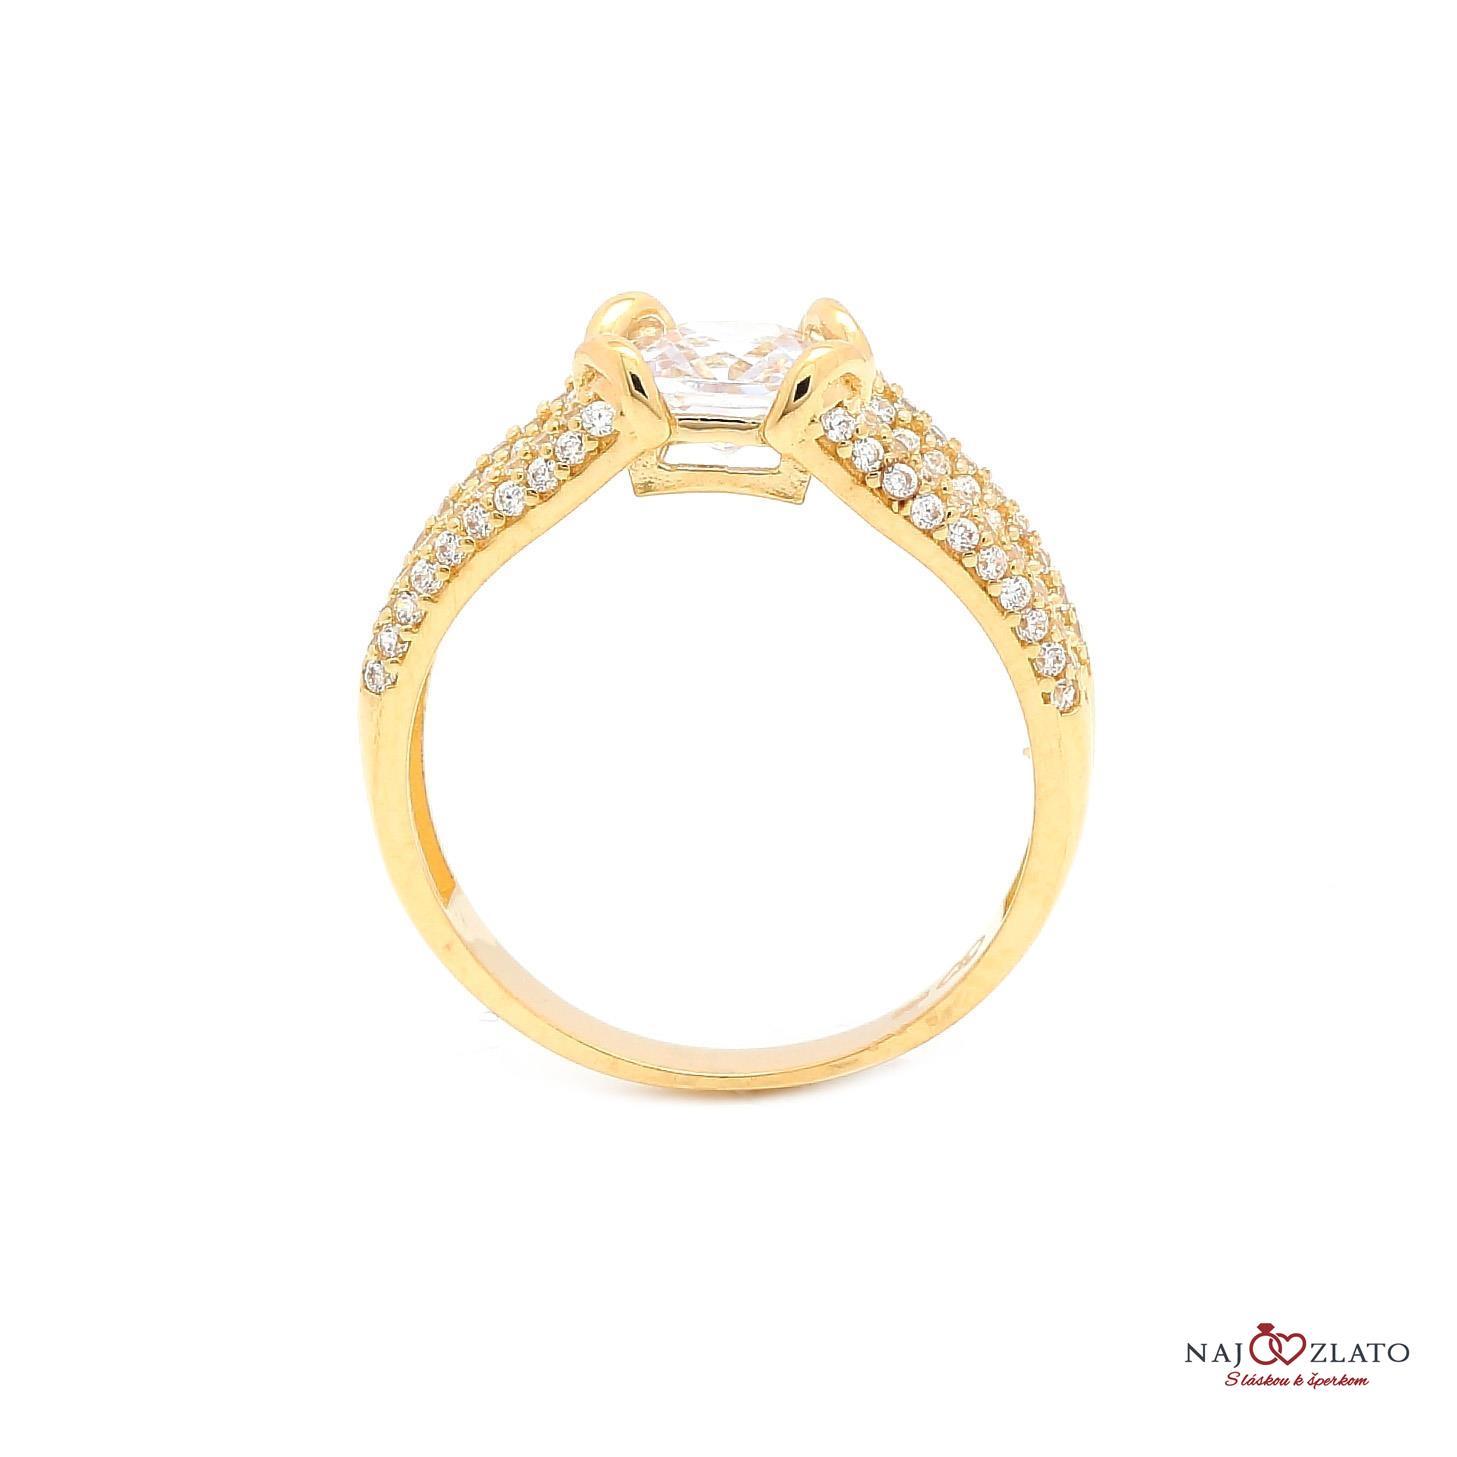 zlatý zásnubný prsteň marijana zlatý zásnubný prsteň marijana 2 ... 186ff221d29